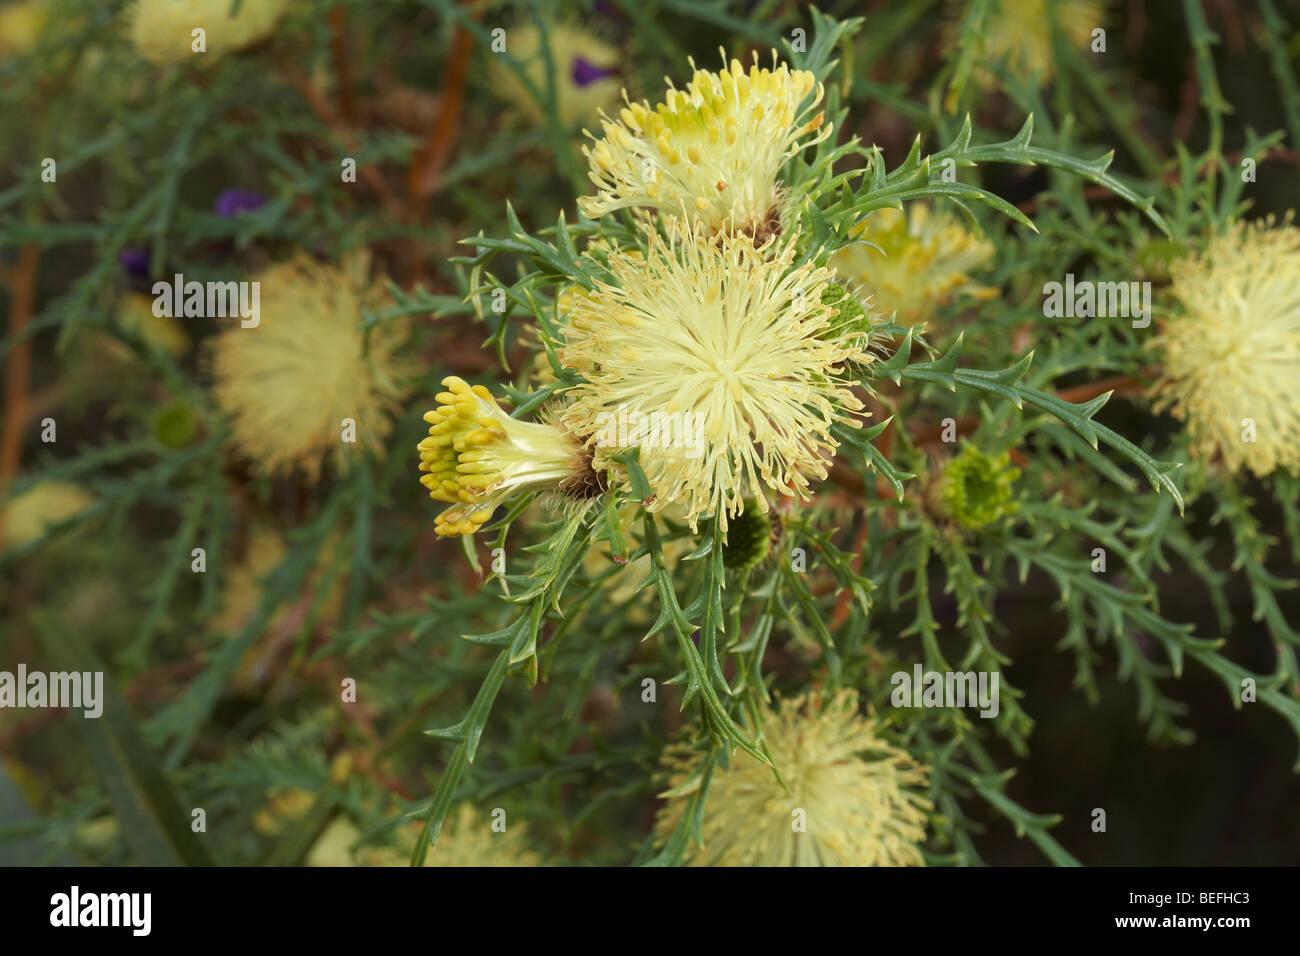 Western Australian native or endemic Dryandra (Banksia) flowers - Stock Image